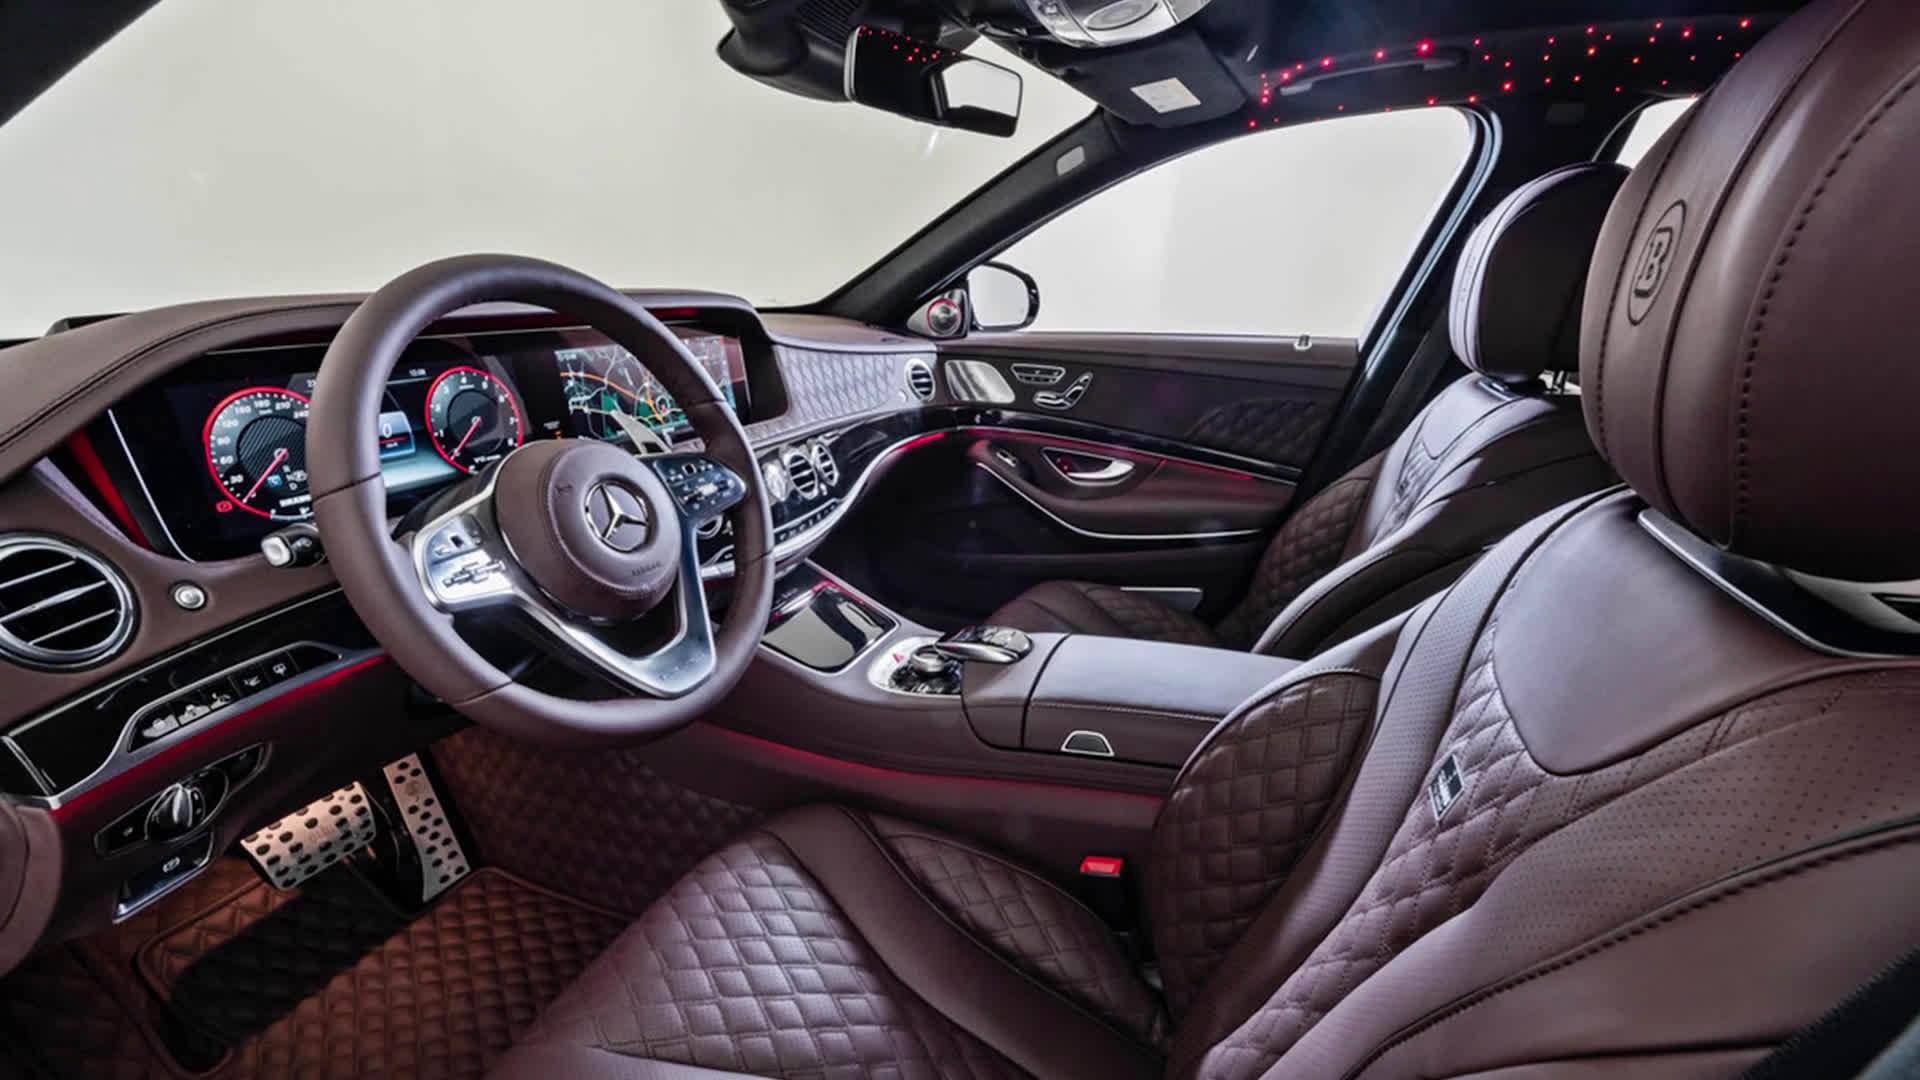 Mercedes Maybach S650 Brabus 900 hp